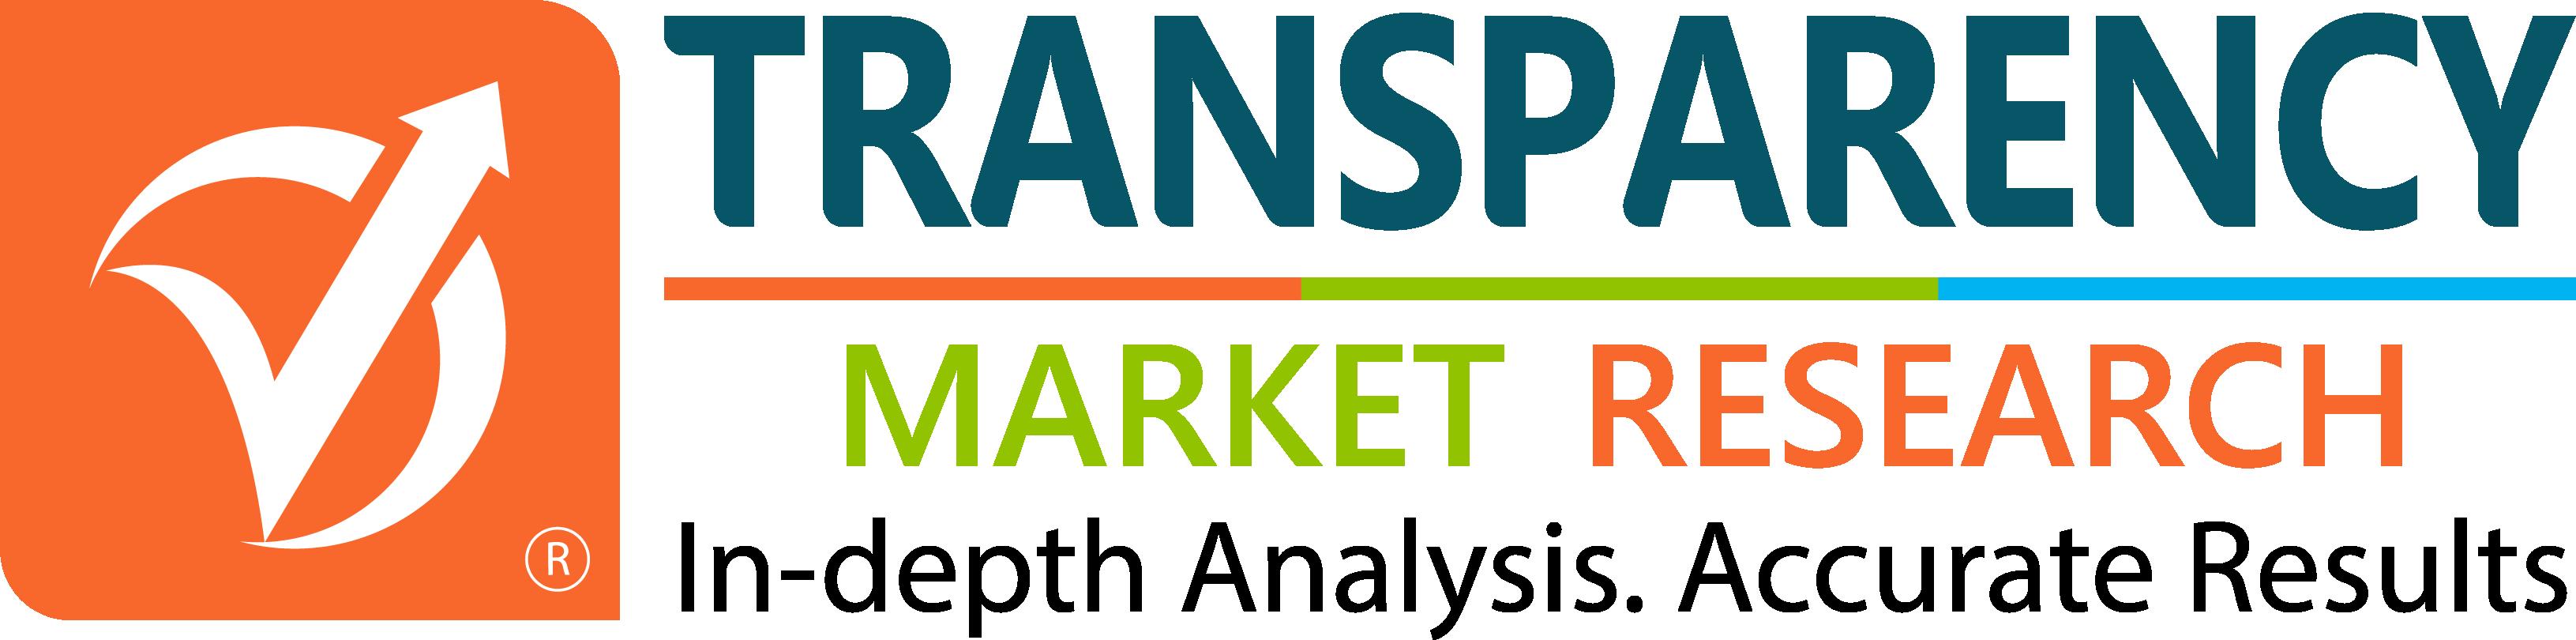 Dental Imaging Market Dynamics, Developments, Potential Players & Worldwide Opportunities, 2019-2027